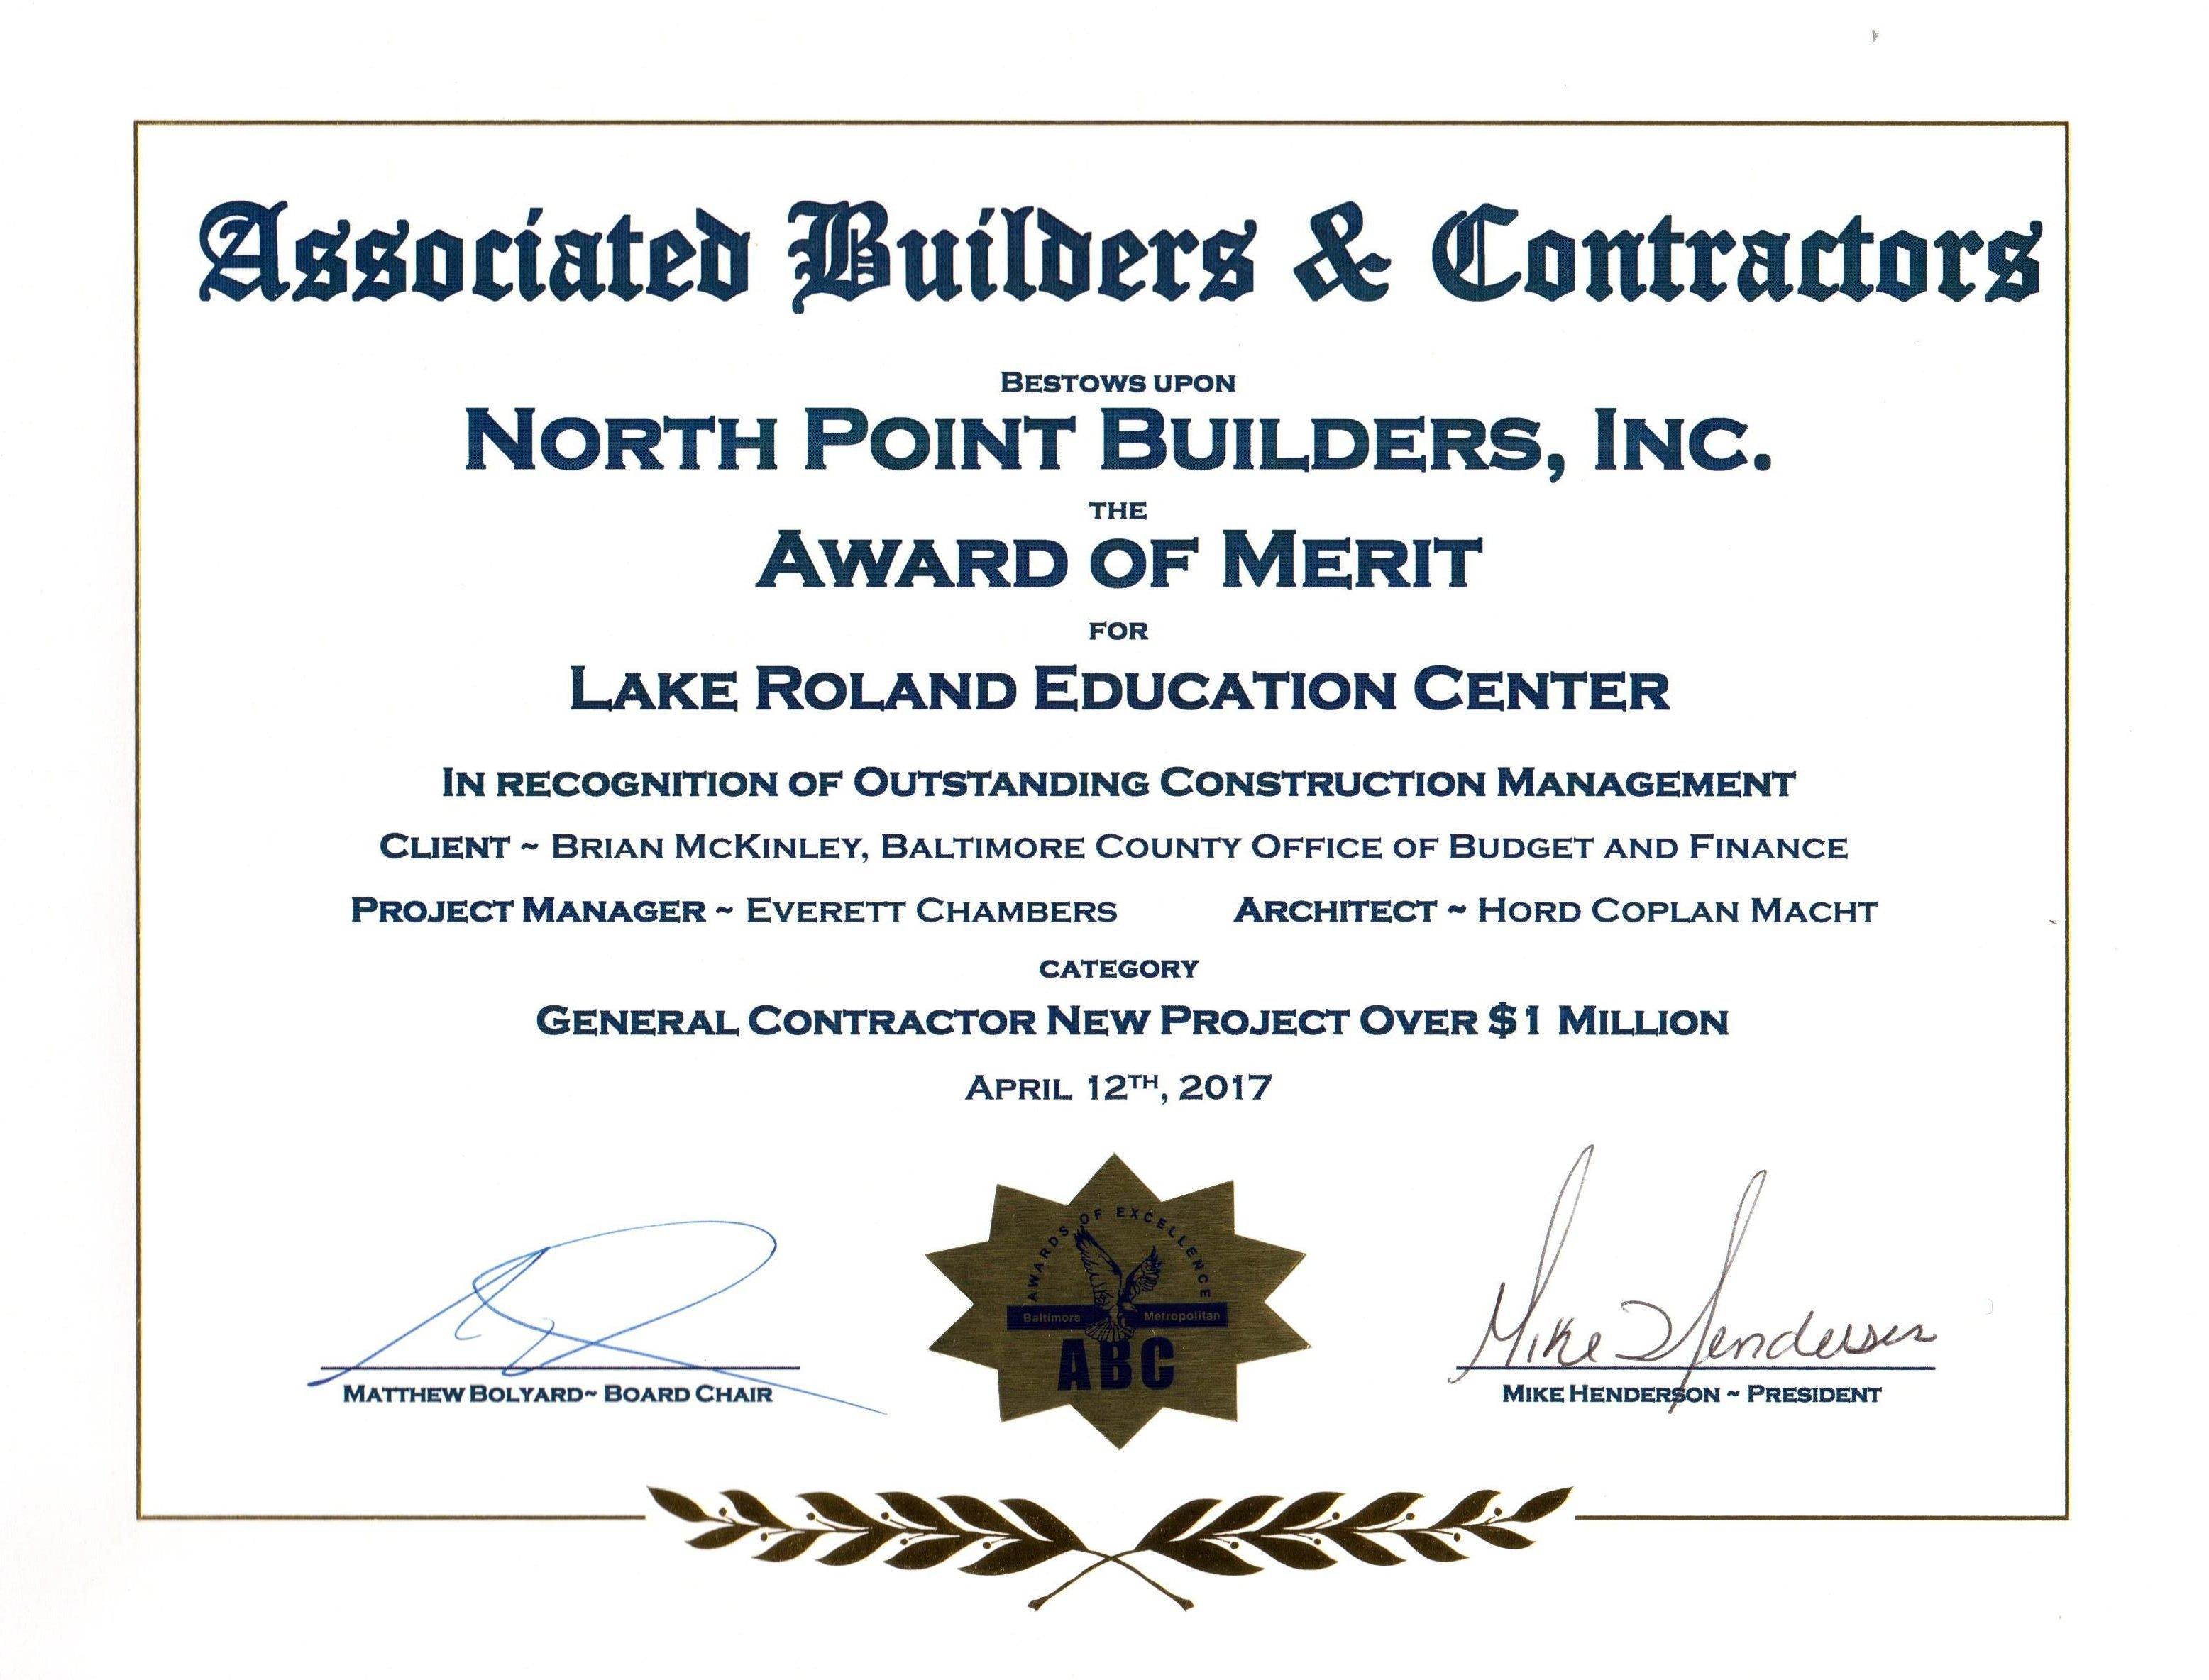 The Nature Center won the prestigious Associated Builders & Contractors Award of Merit